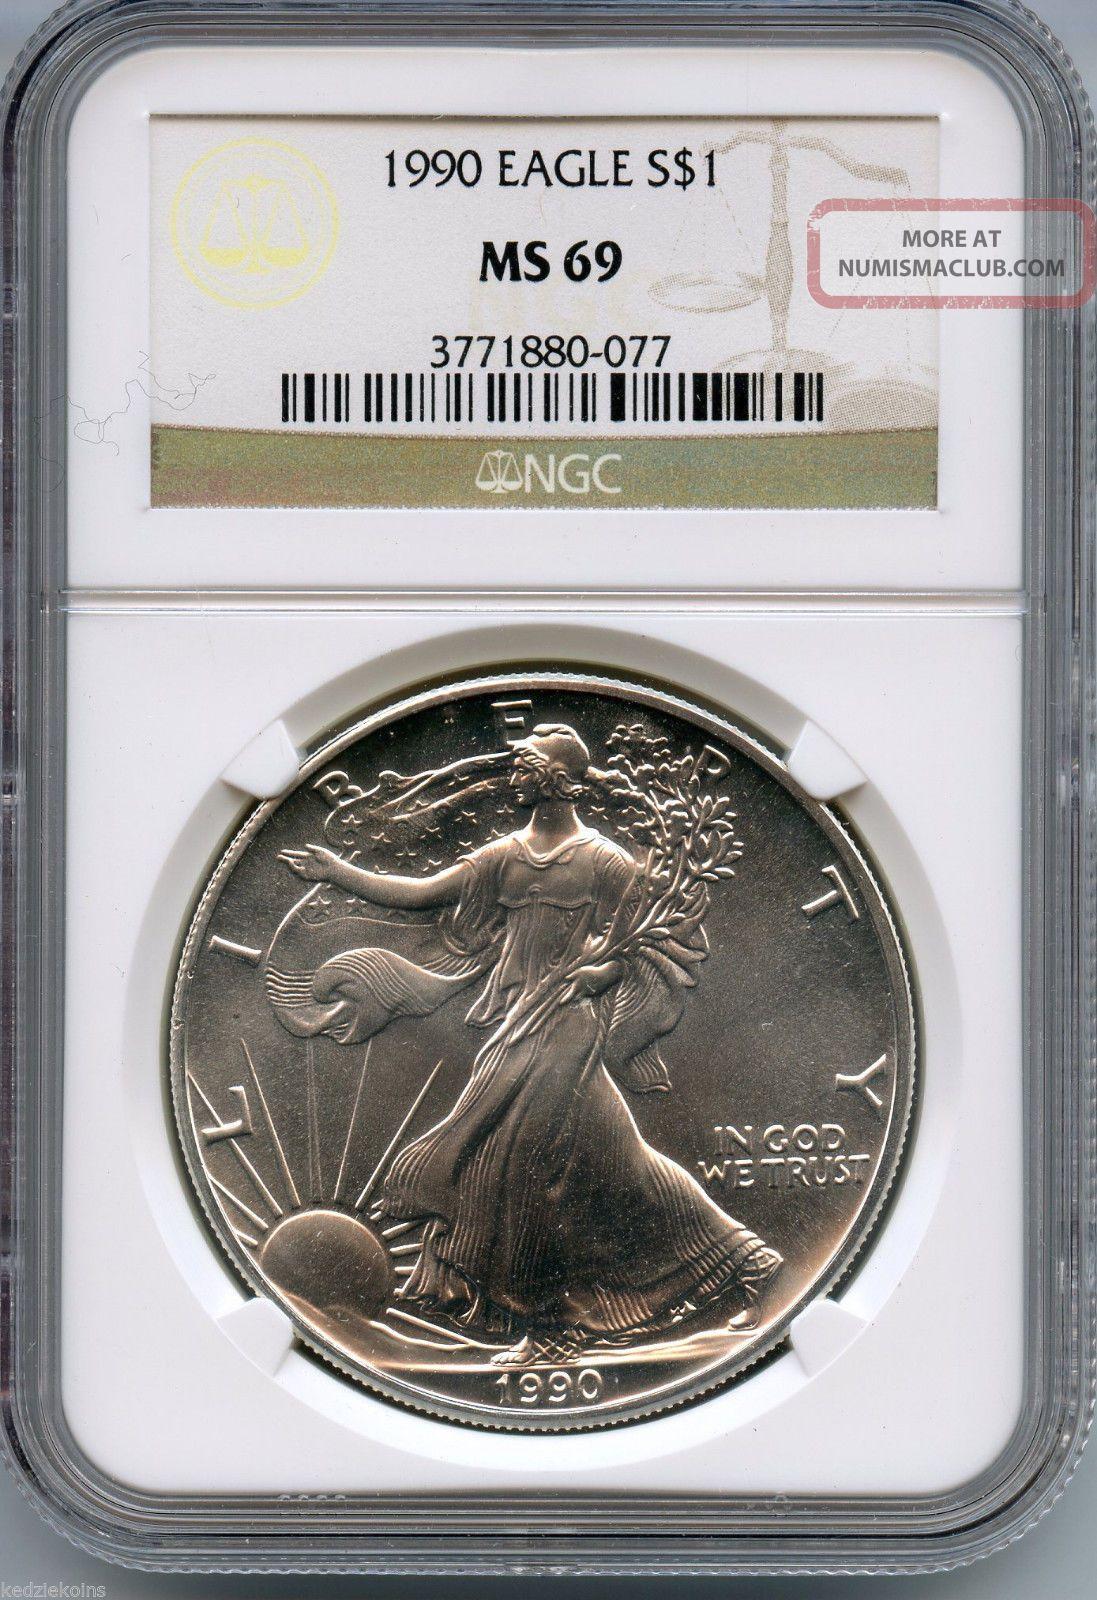 1990 Ngc Ms 69 American Eagle 999 Silver Dollar 1 Oz